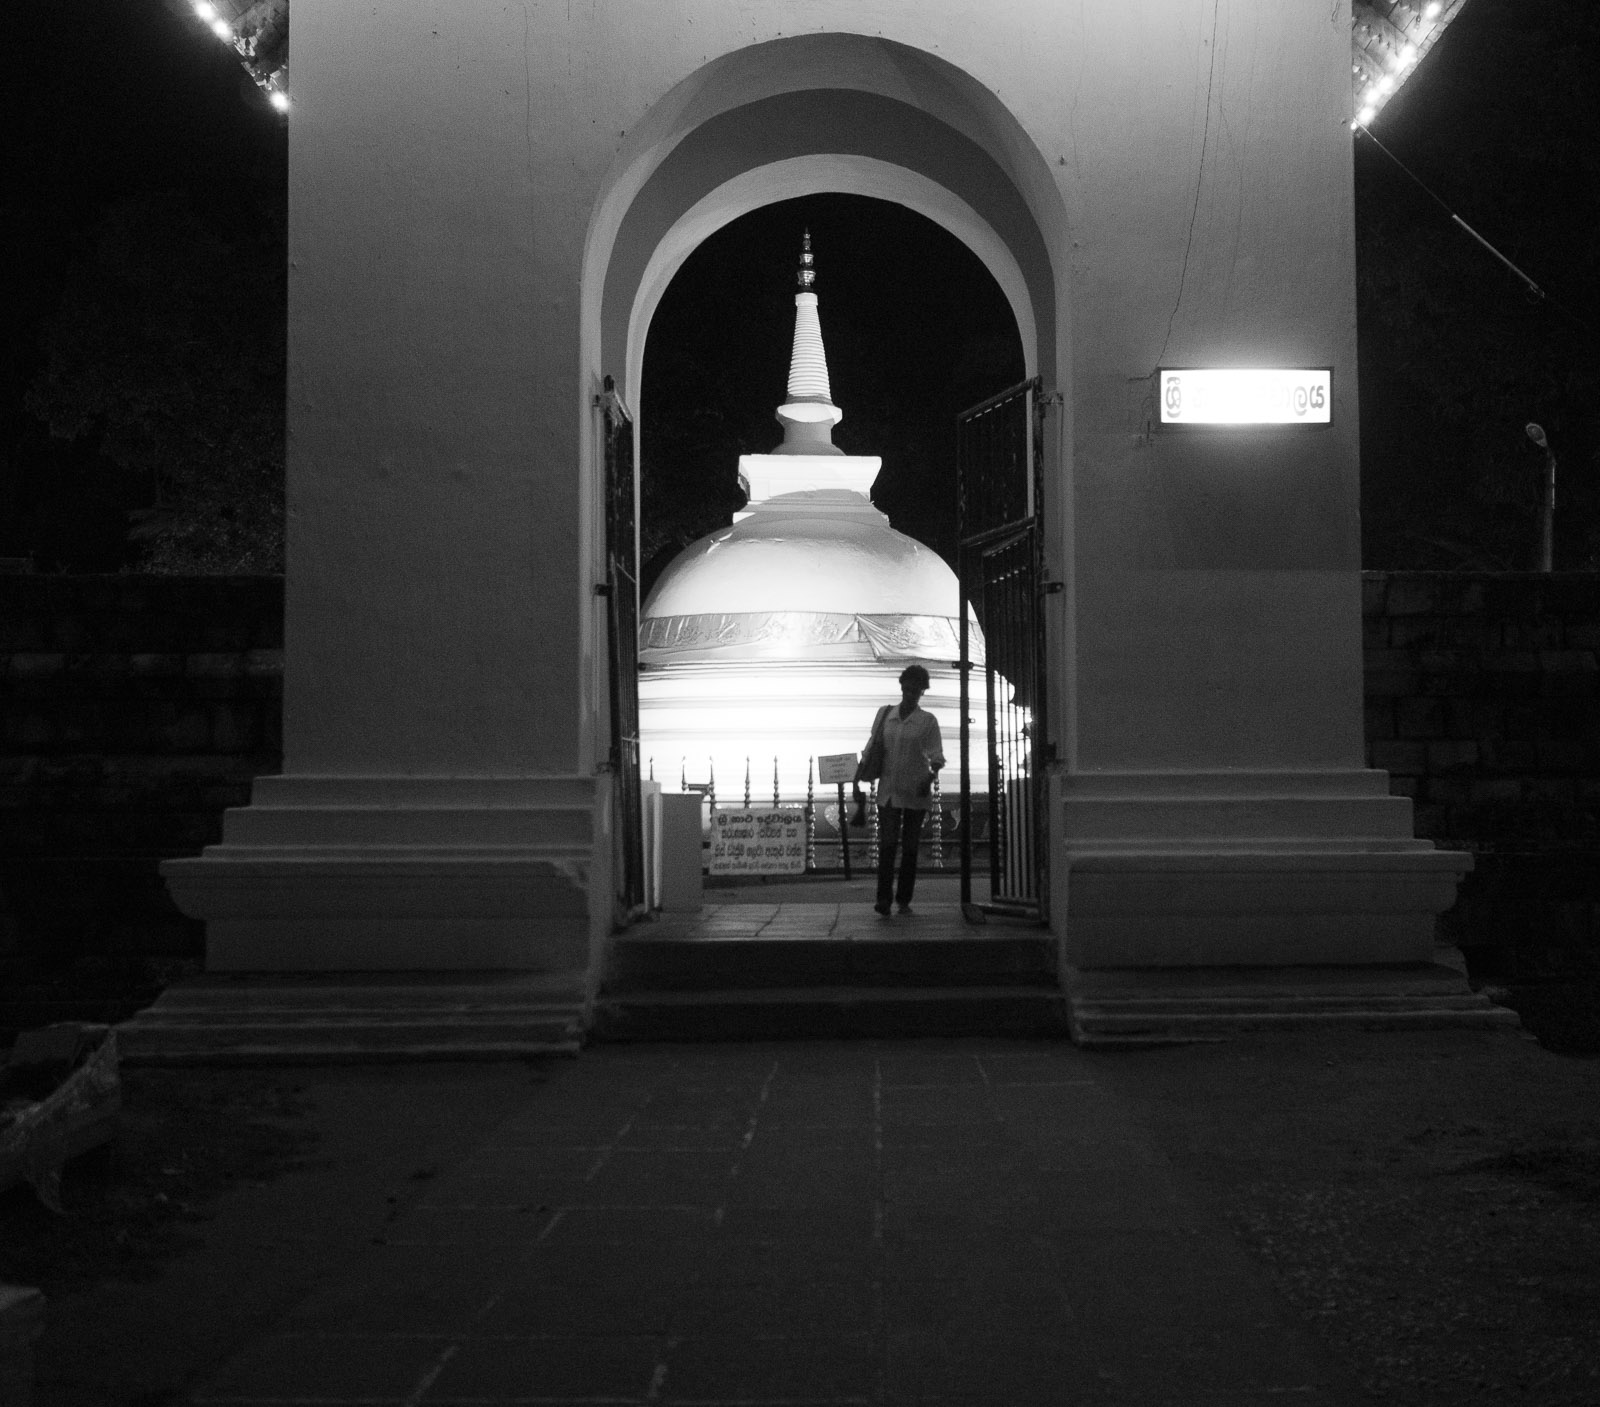 20160701-sri lanka-833